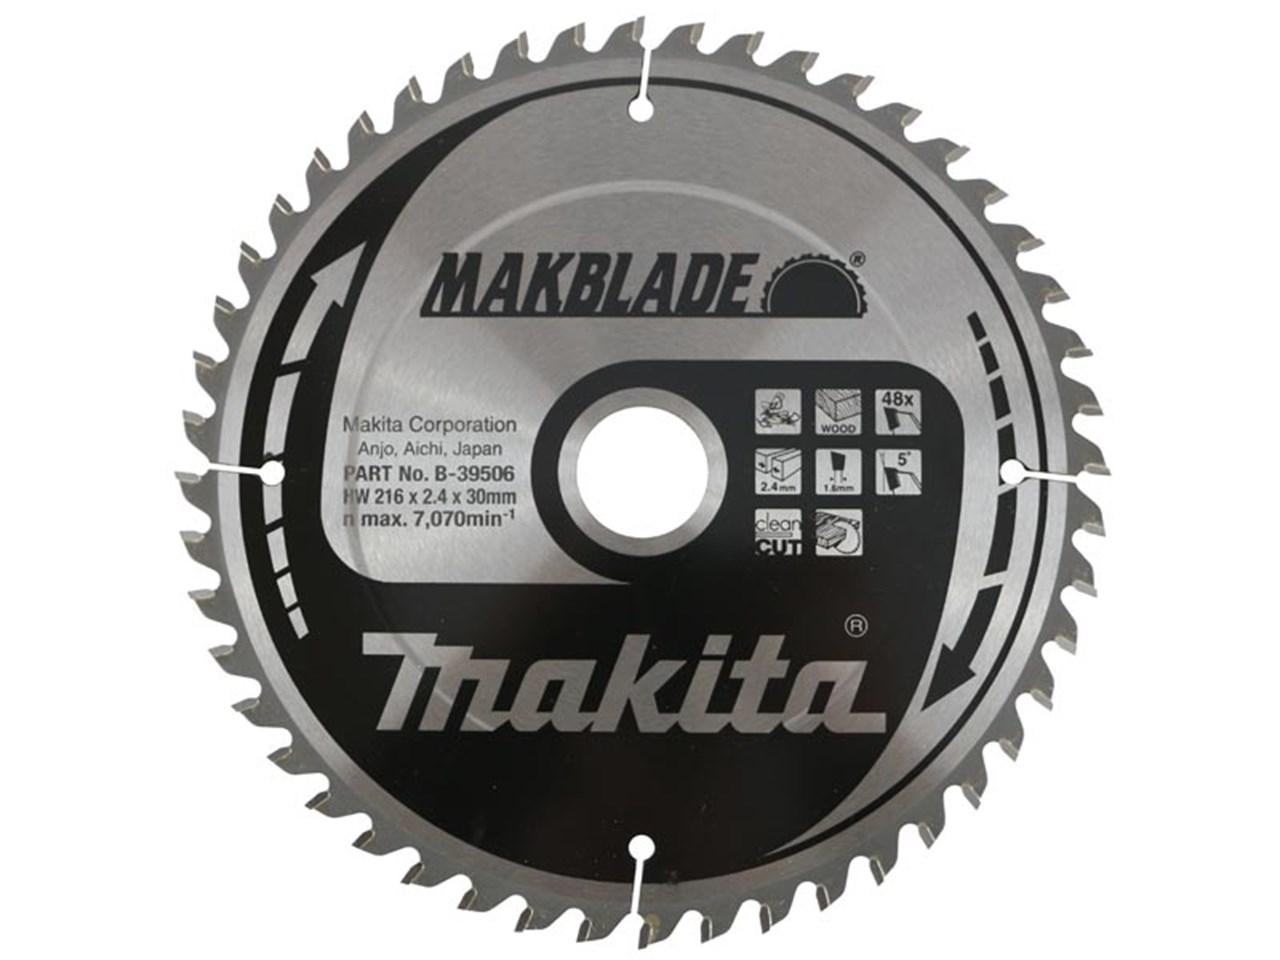 Fräscha Makita B-39506 216mm x 30mm x 48T Makblade Mitre Saw Blade WS-07